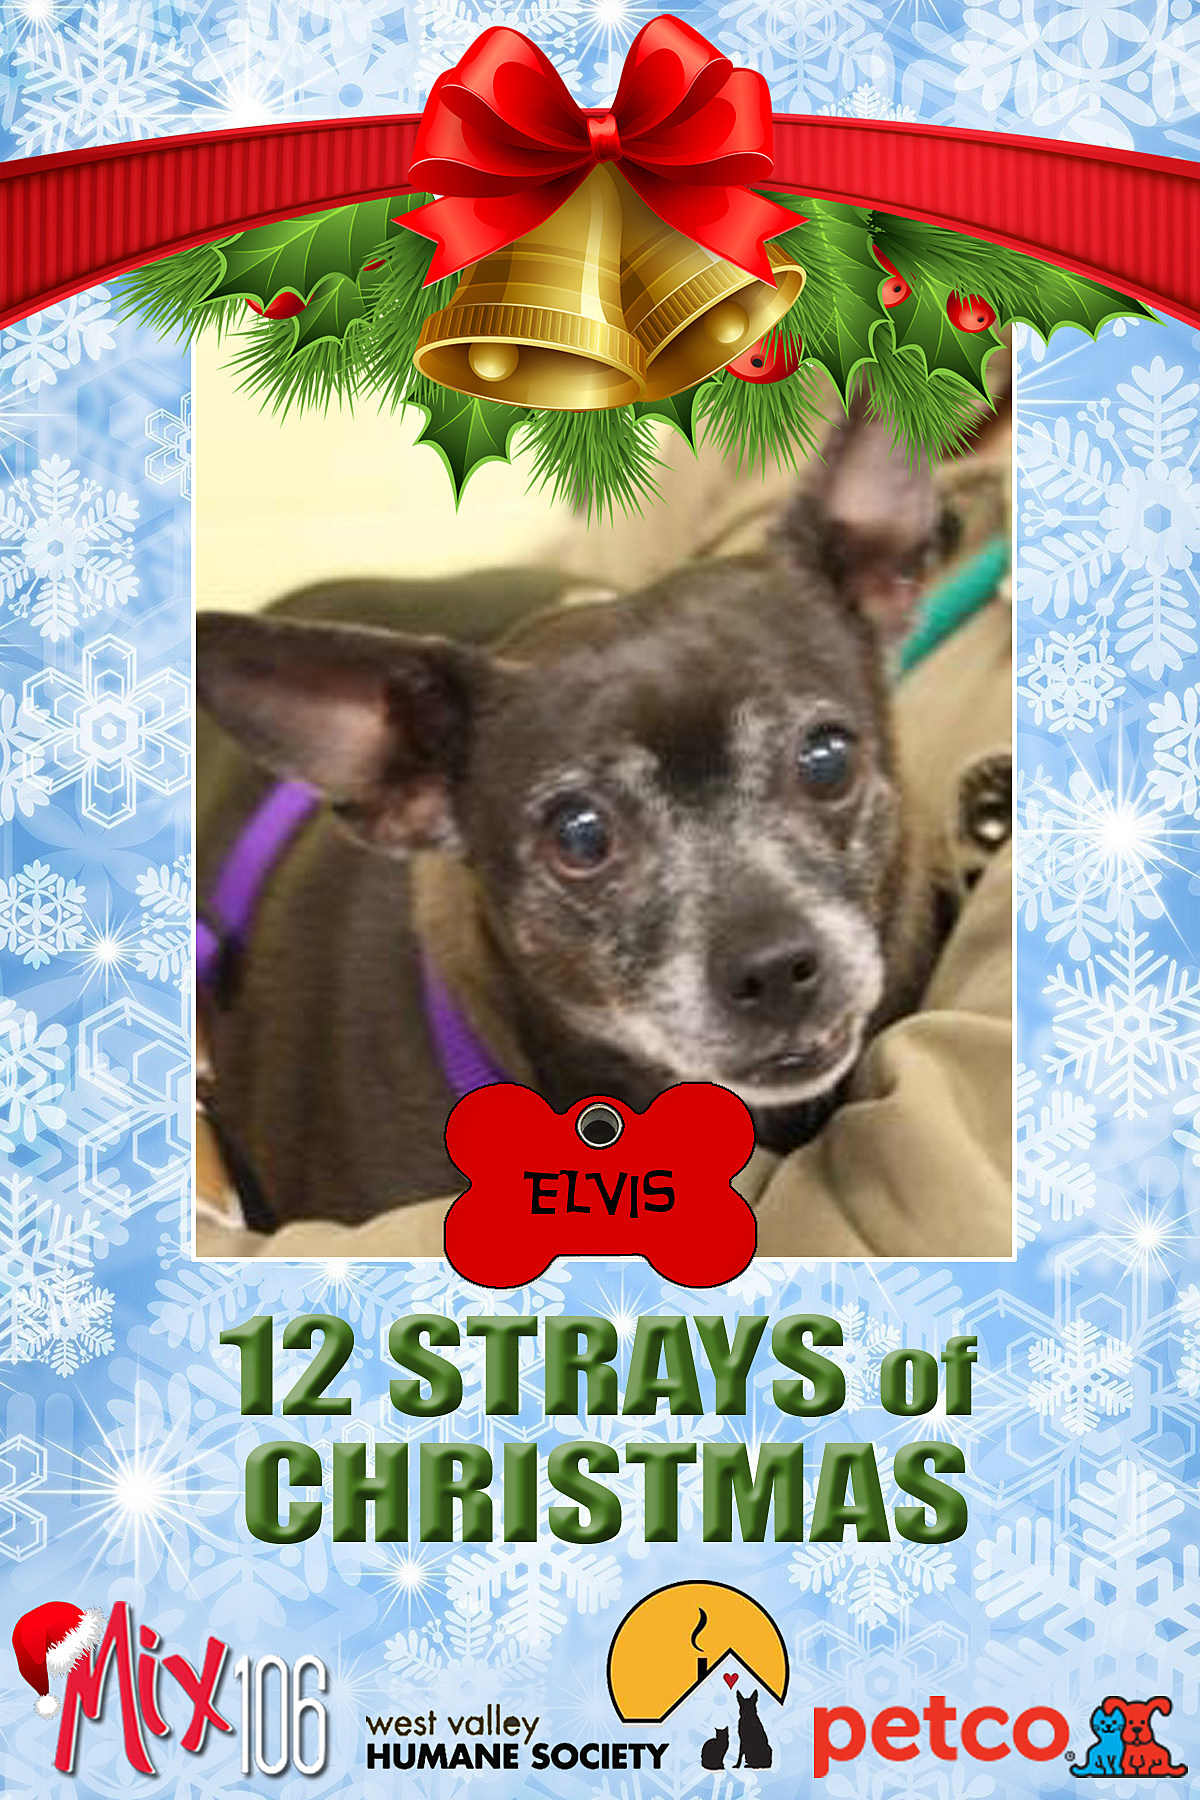 12 strays of christmas ELVIS